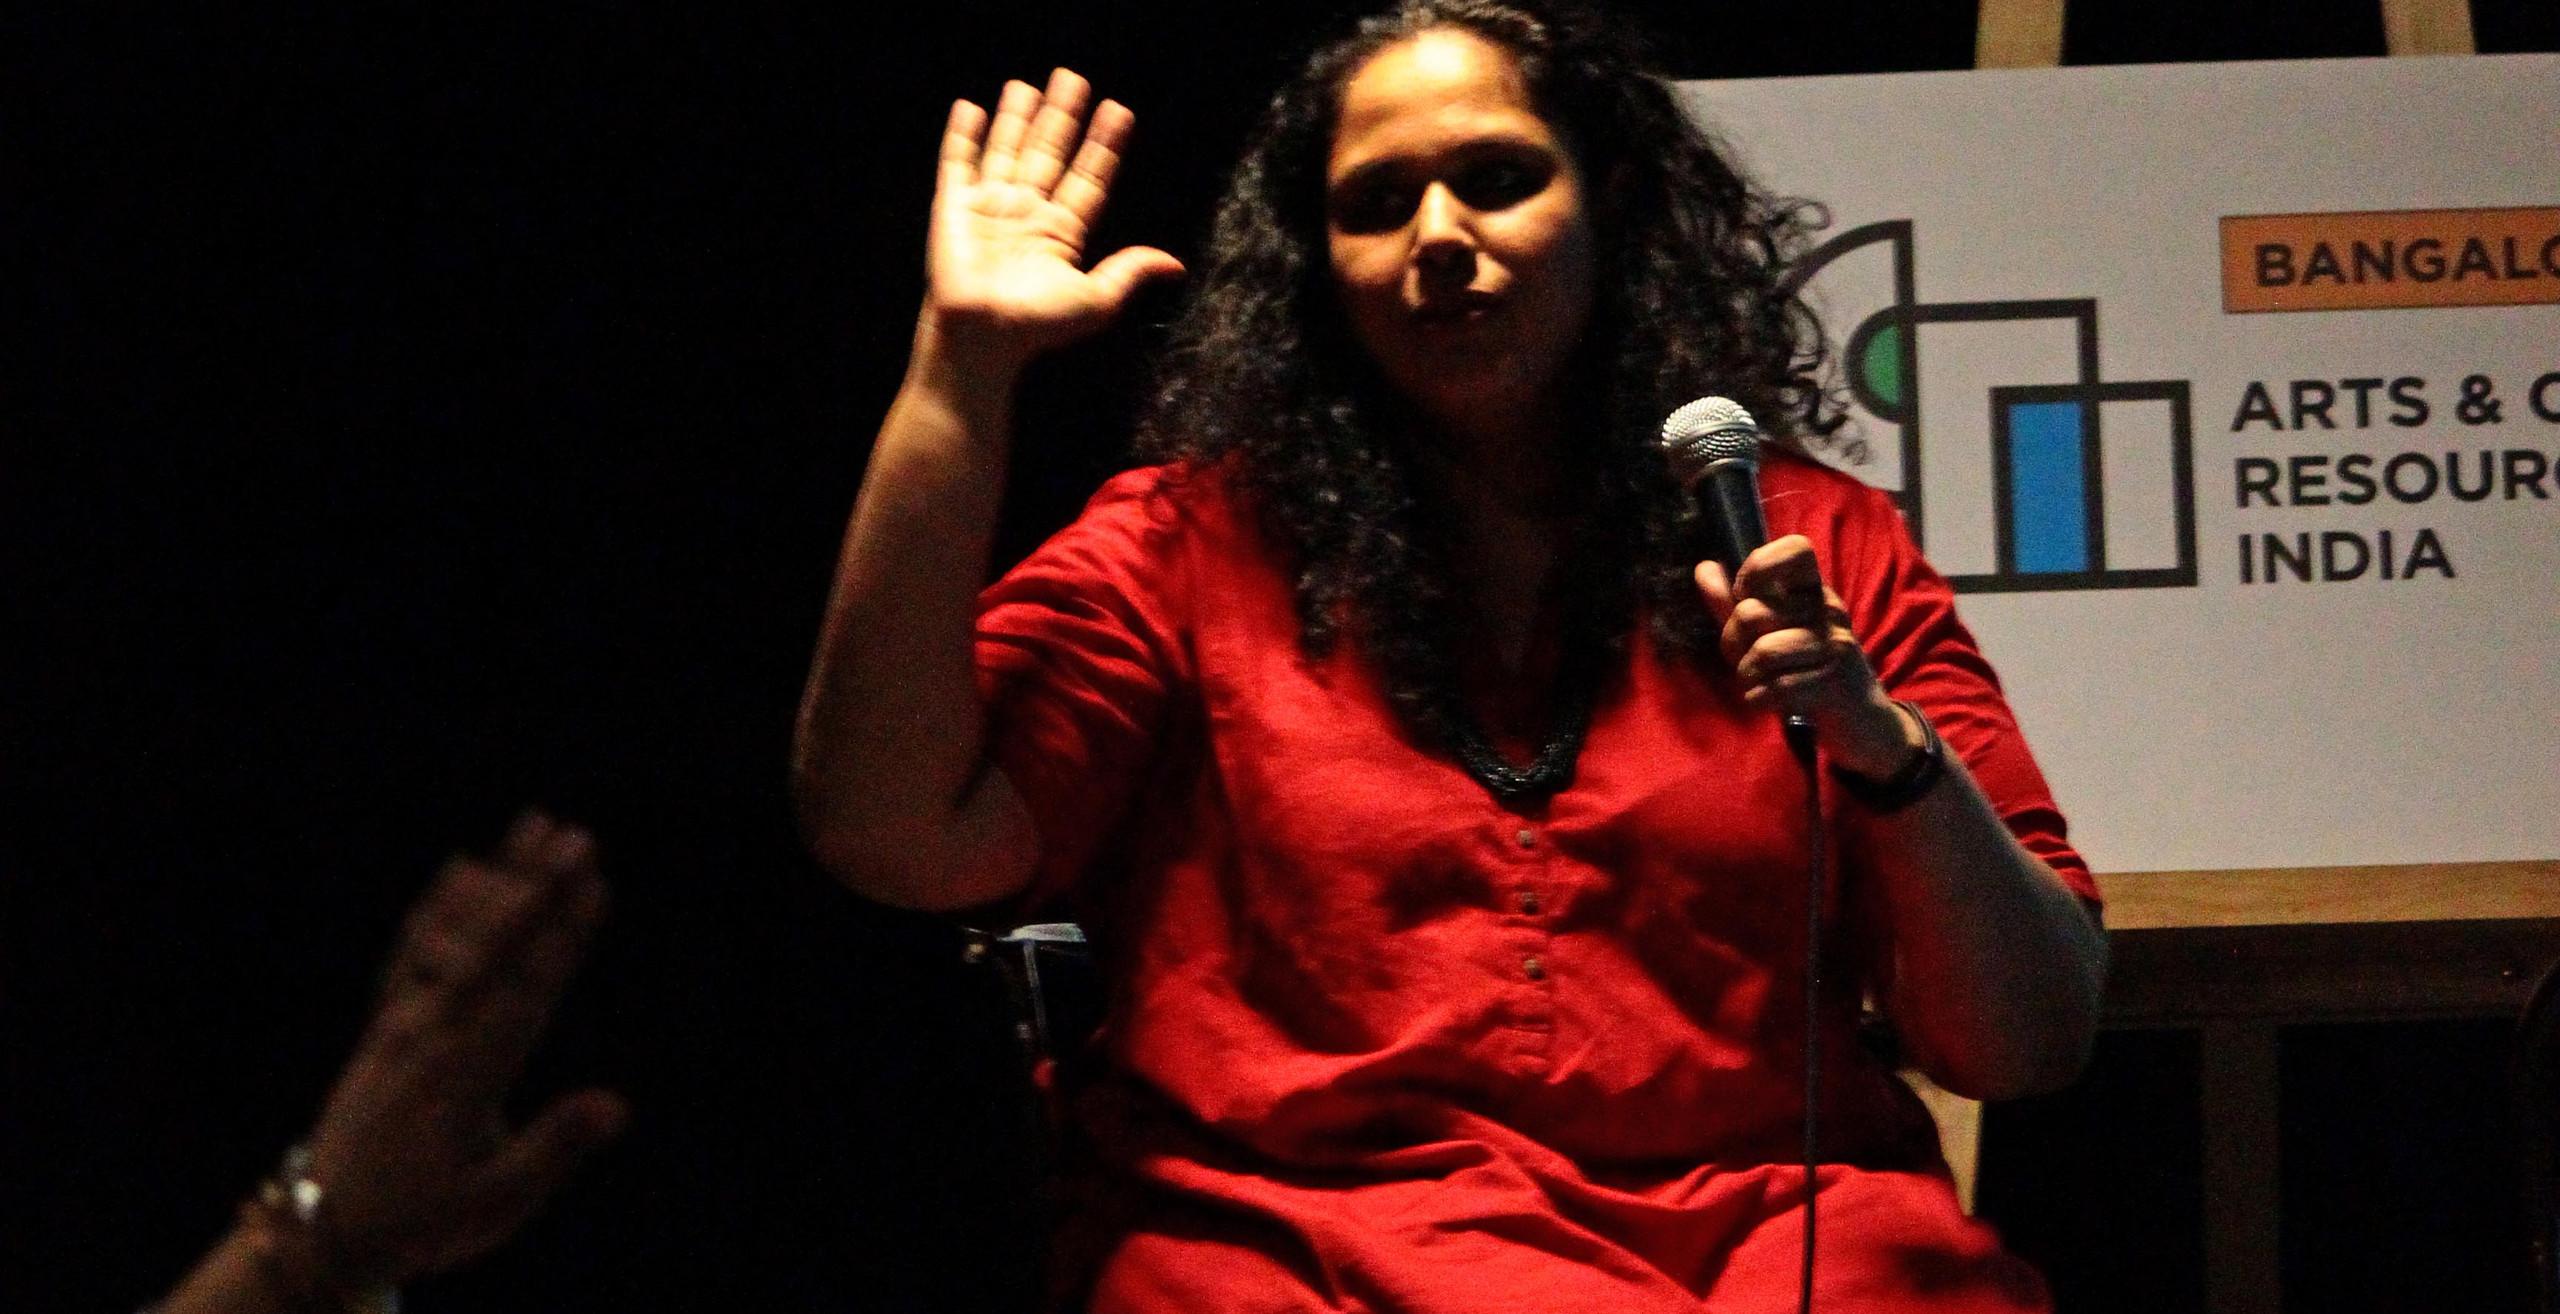 ACRI Bengaluru Menaka Rodrigues